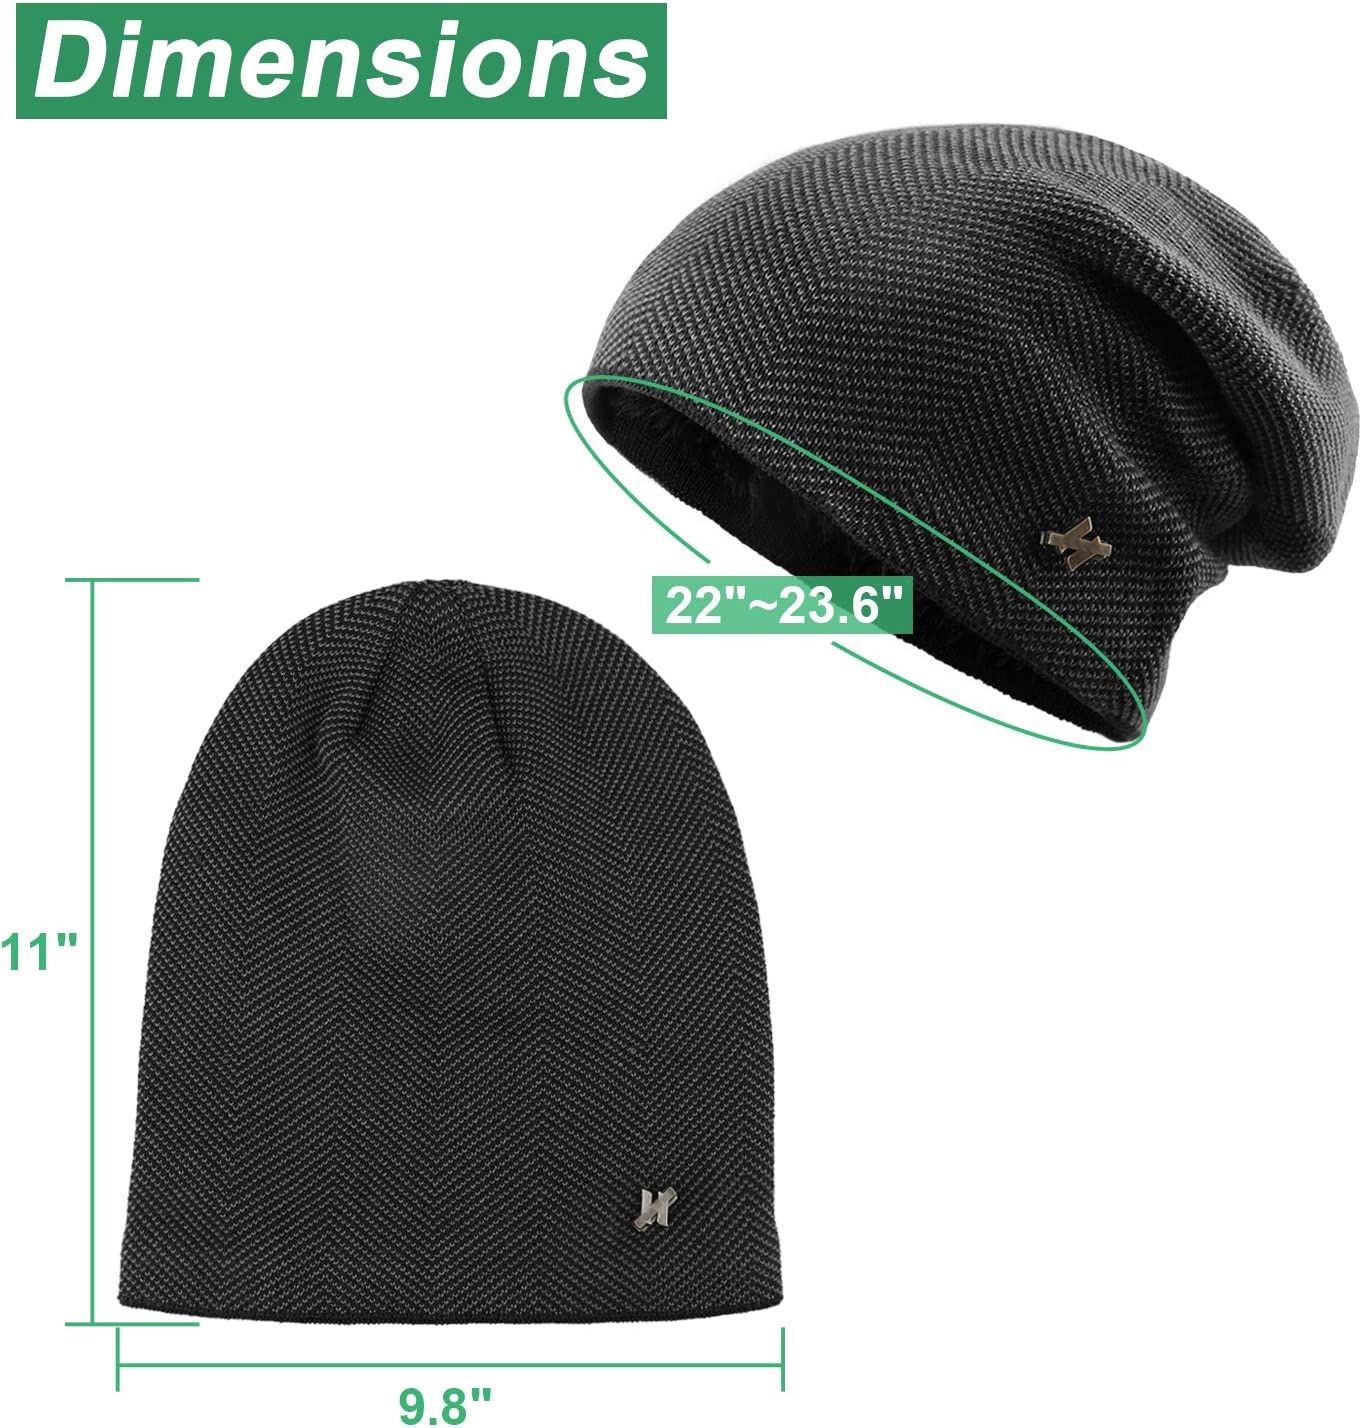 Magarrow Outdoor Winter Beanie Warm Knitted Hat Sports Hat Skiing Cycling Running Hiking Men Women Unisex